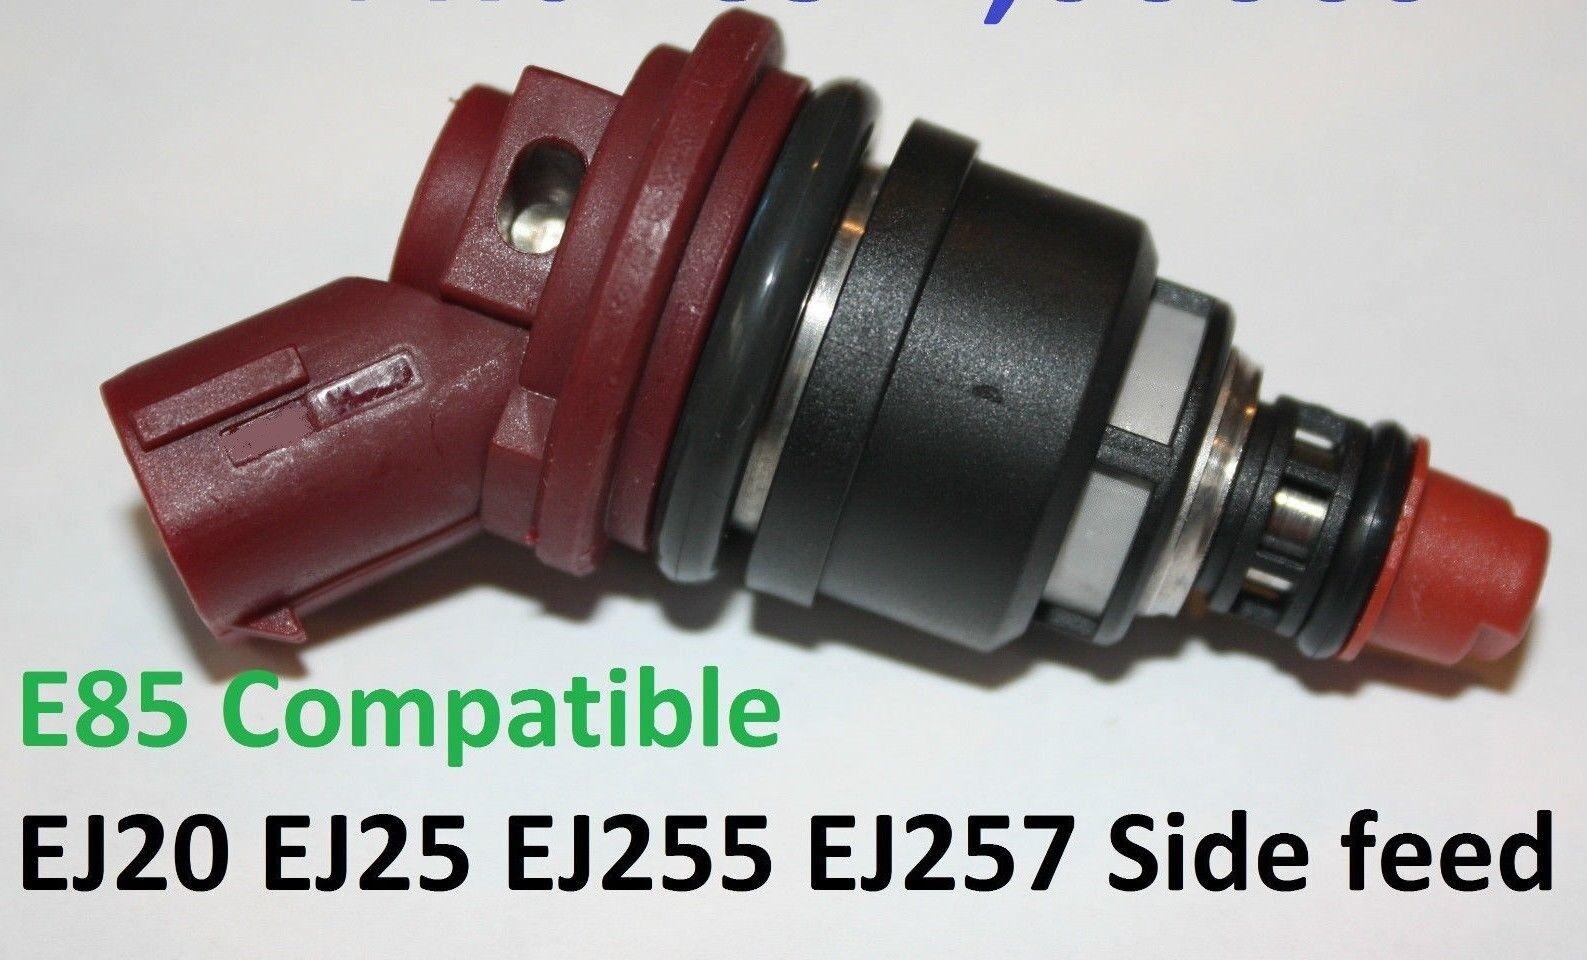 4 1000CC Side Feed Fuel Injectors fit SUBARU WRX STI EJ20 E85 EJ25